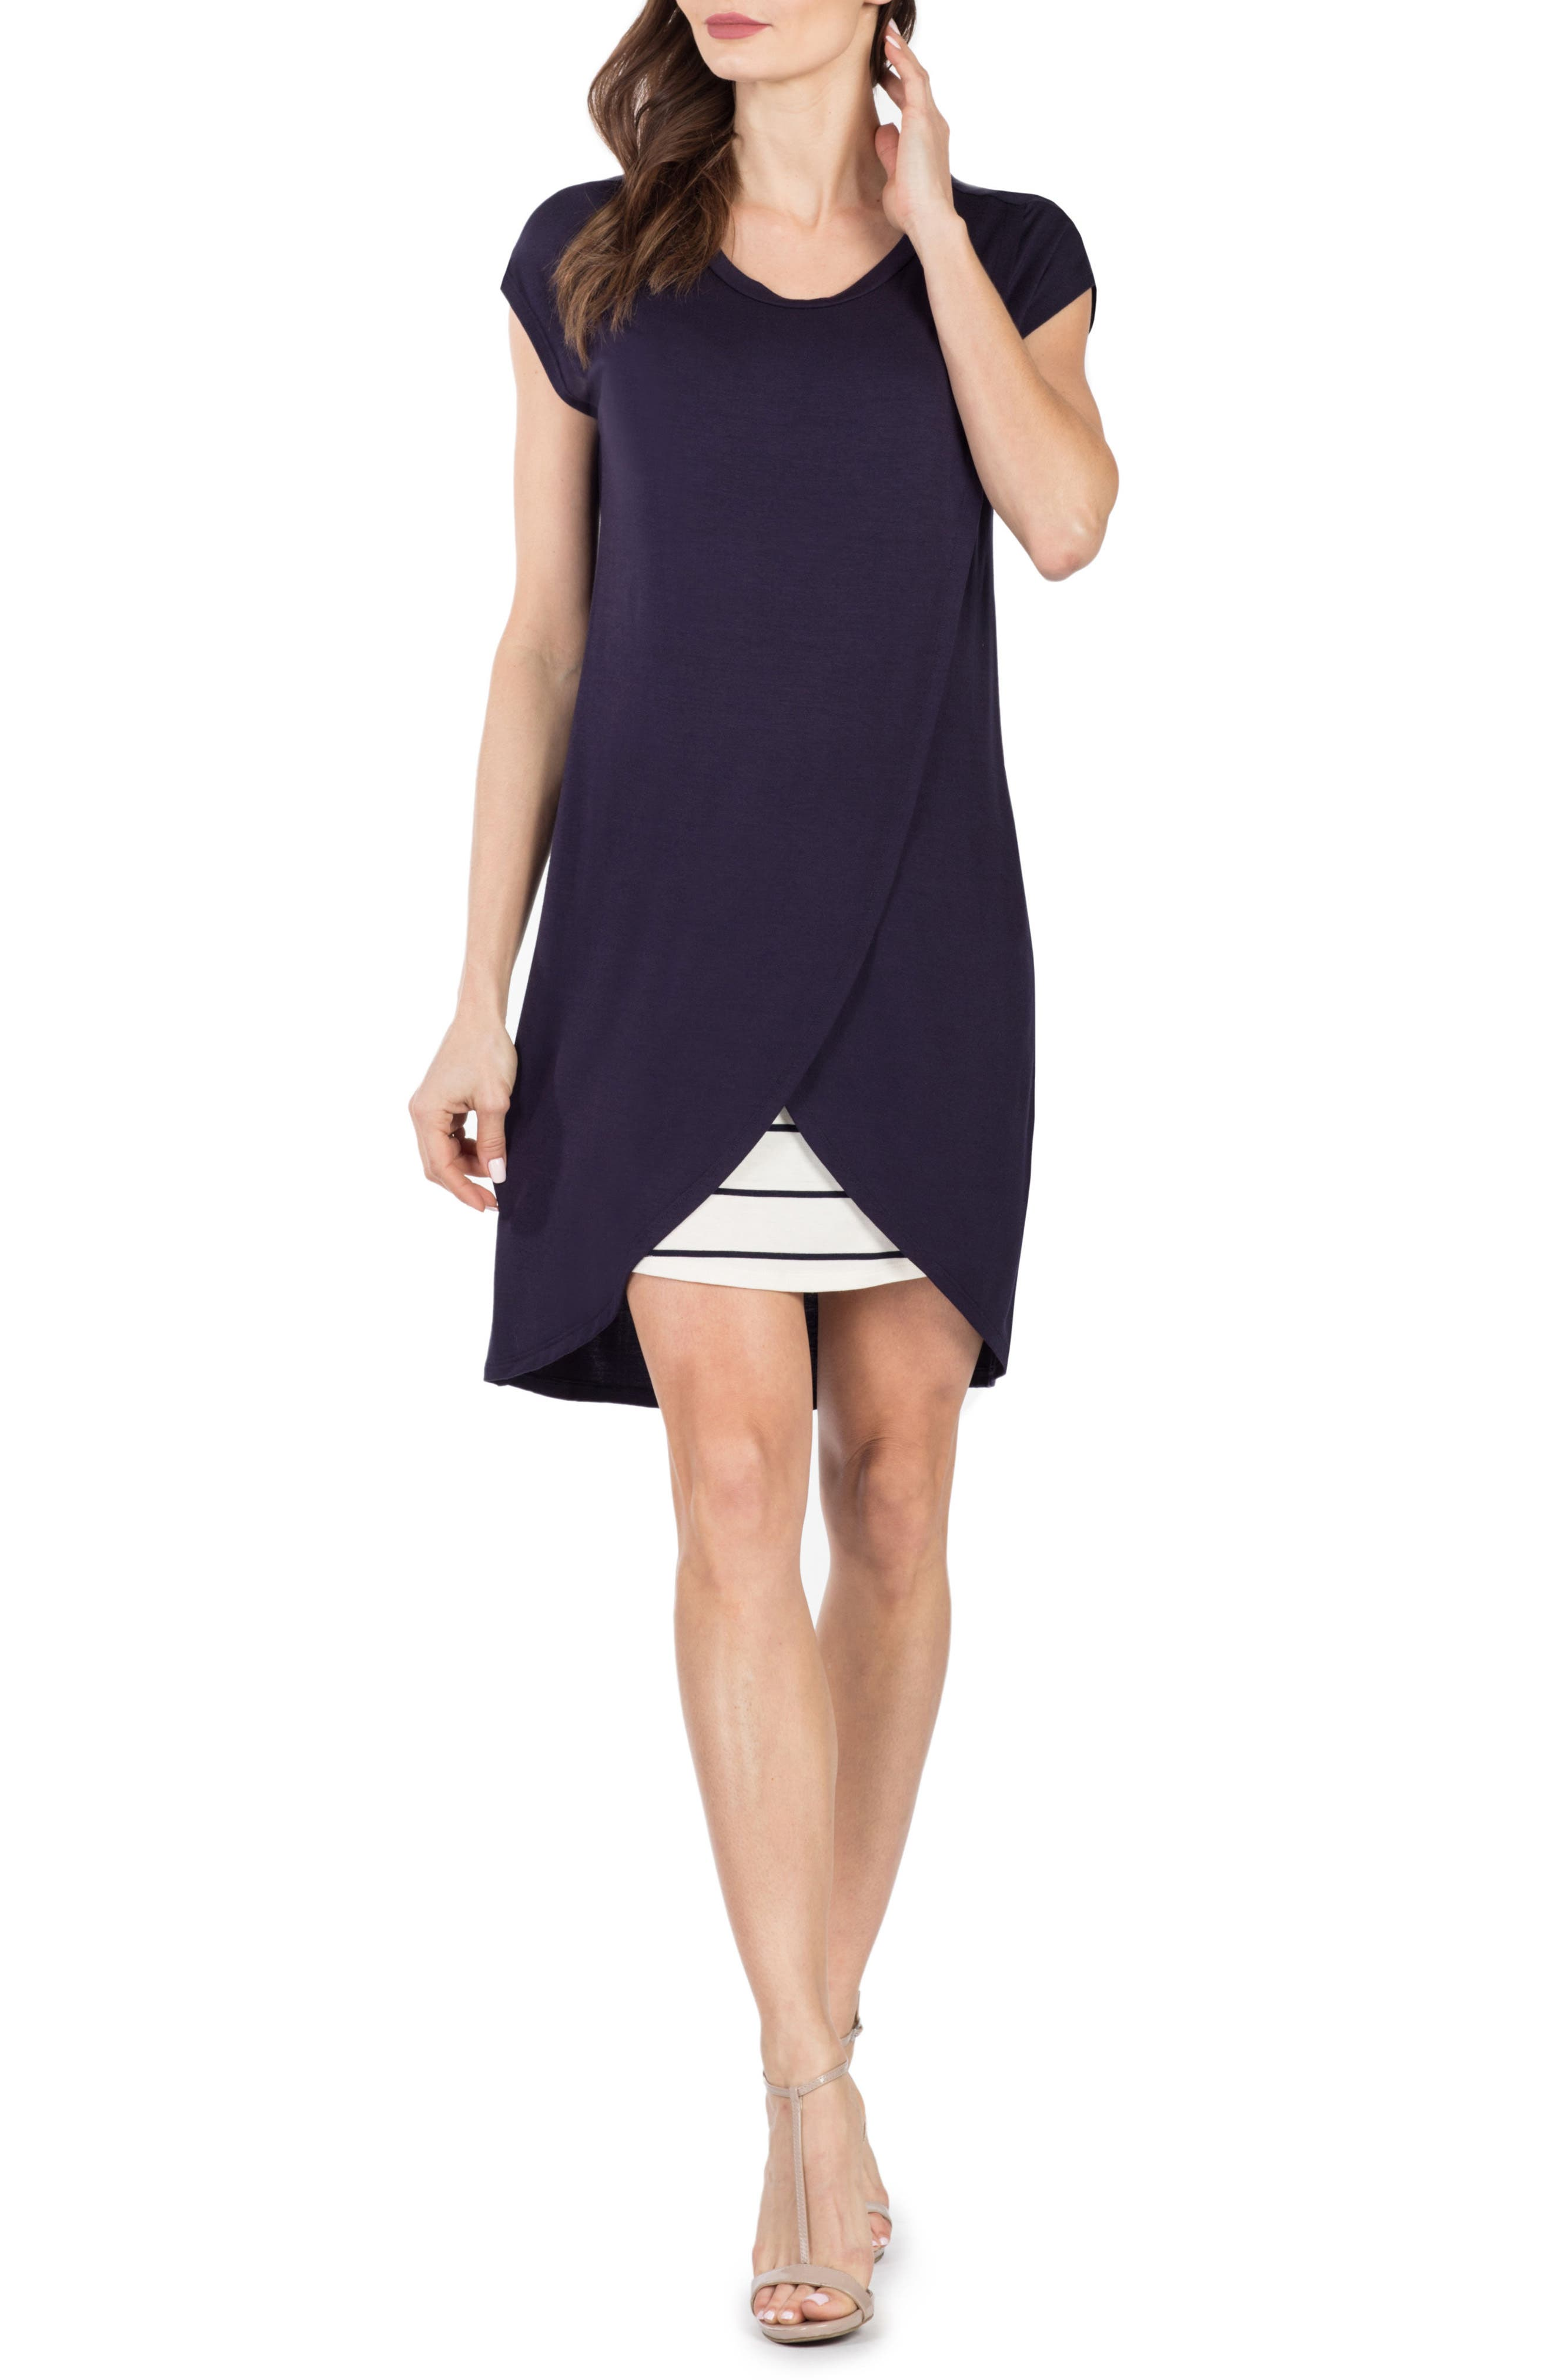 Lille Layered Maternity/Nursing Sheath Dress,                             Main thumbnail 1, color,                             NAVY/ WHITE STRIPE